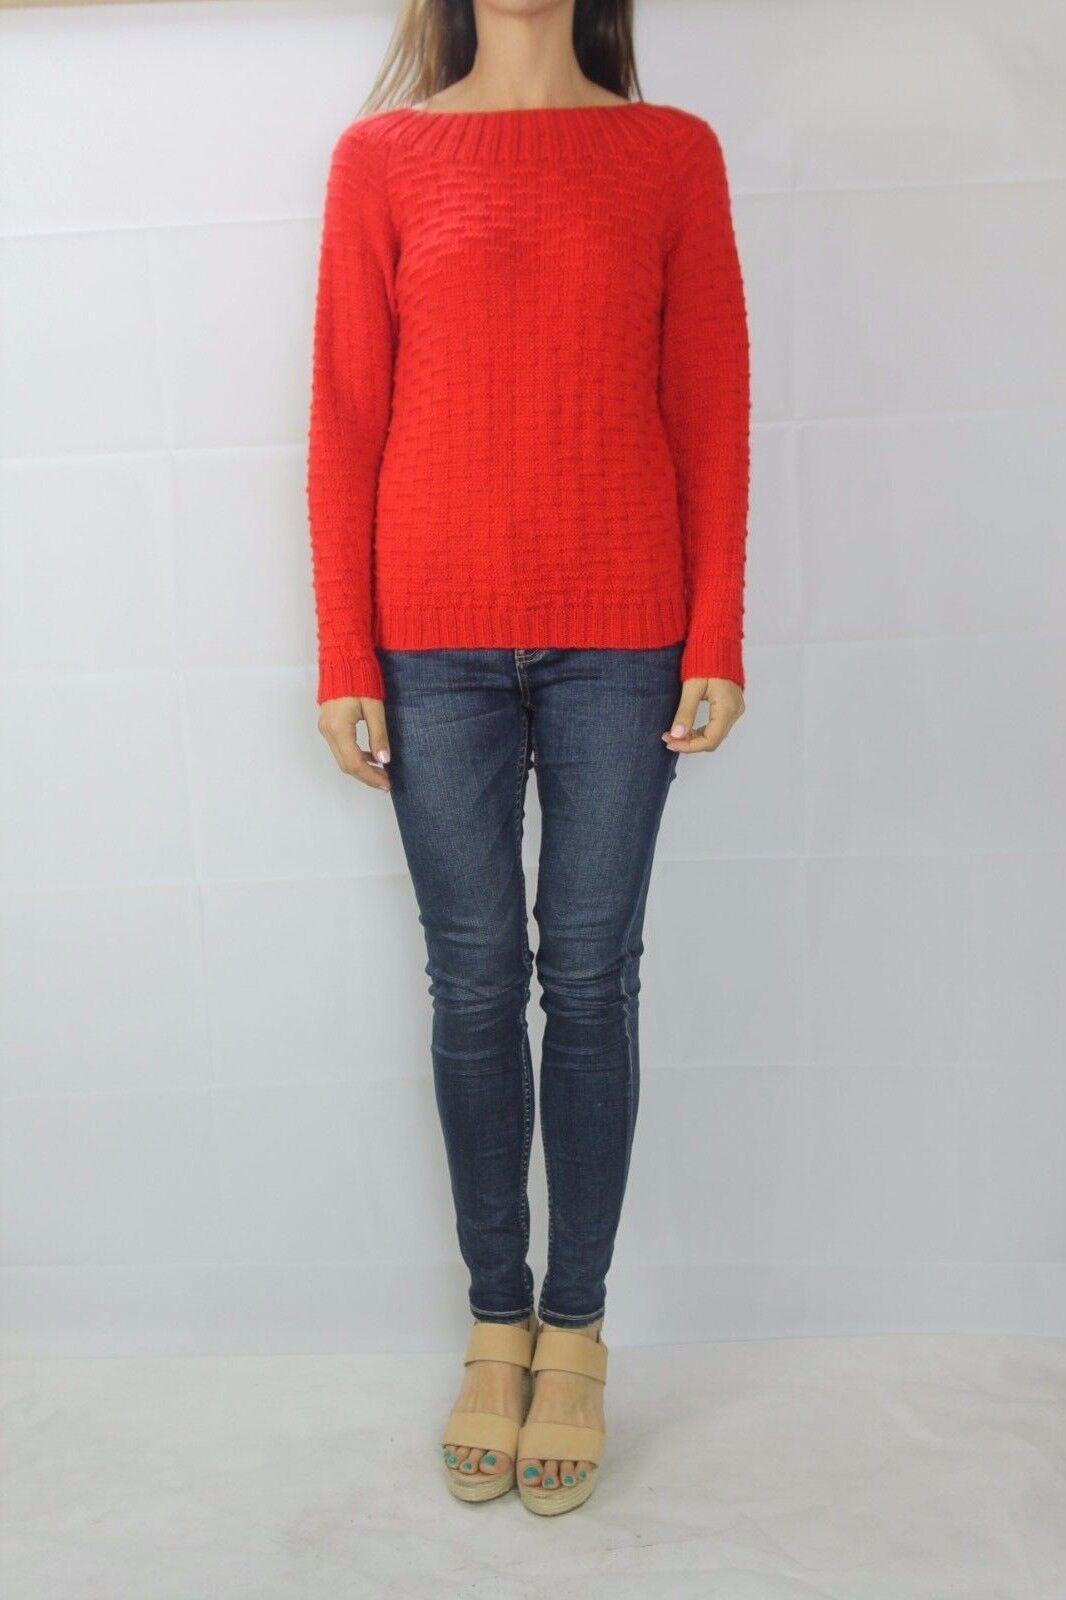 VINTAGE Red Knit Jumper 1980's Wool Sweater Size XS (8 AU Beste fit)